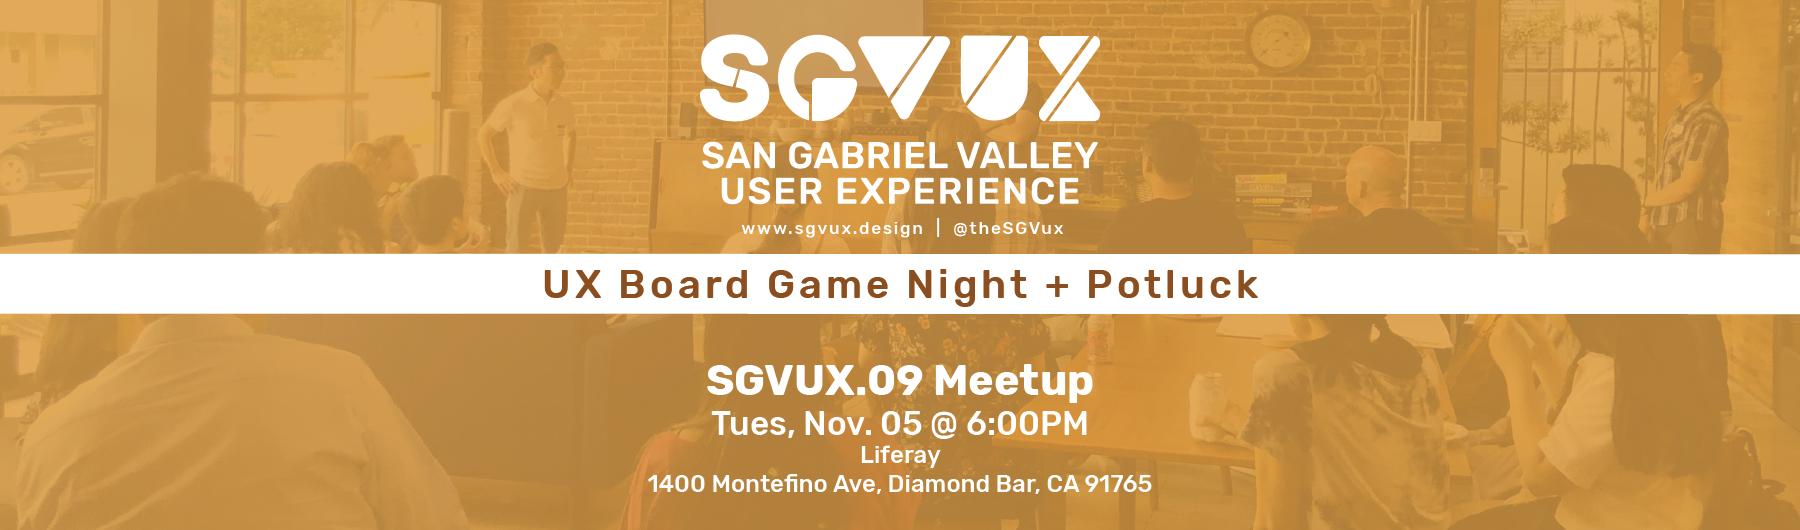 SGVUX.09 UX Board Game Night + Pre-Thanksgiving Potluck